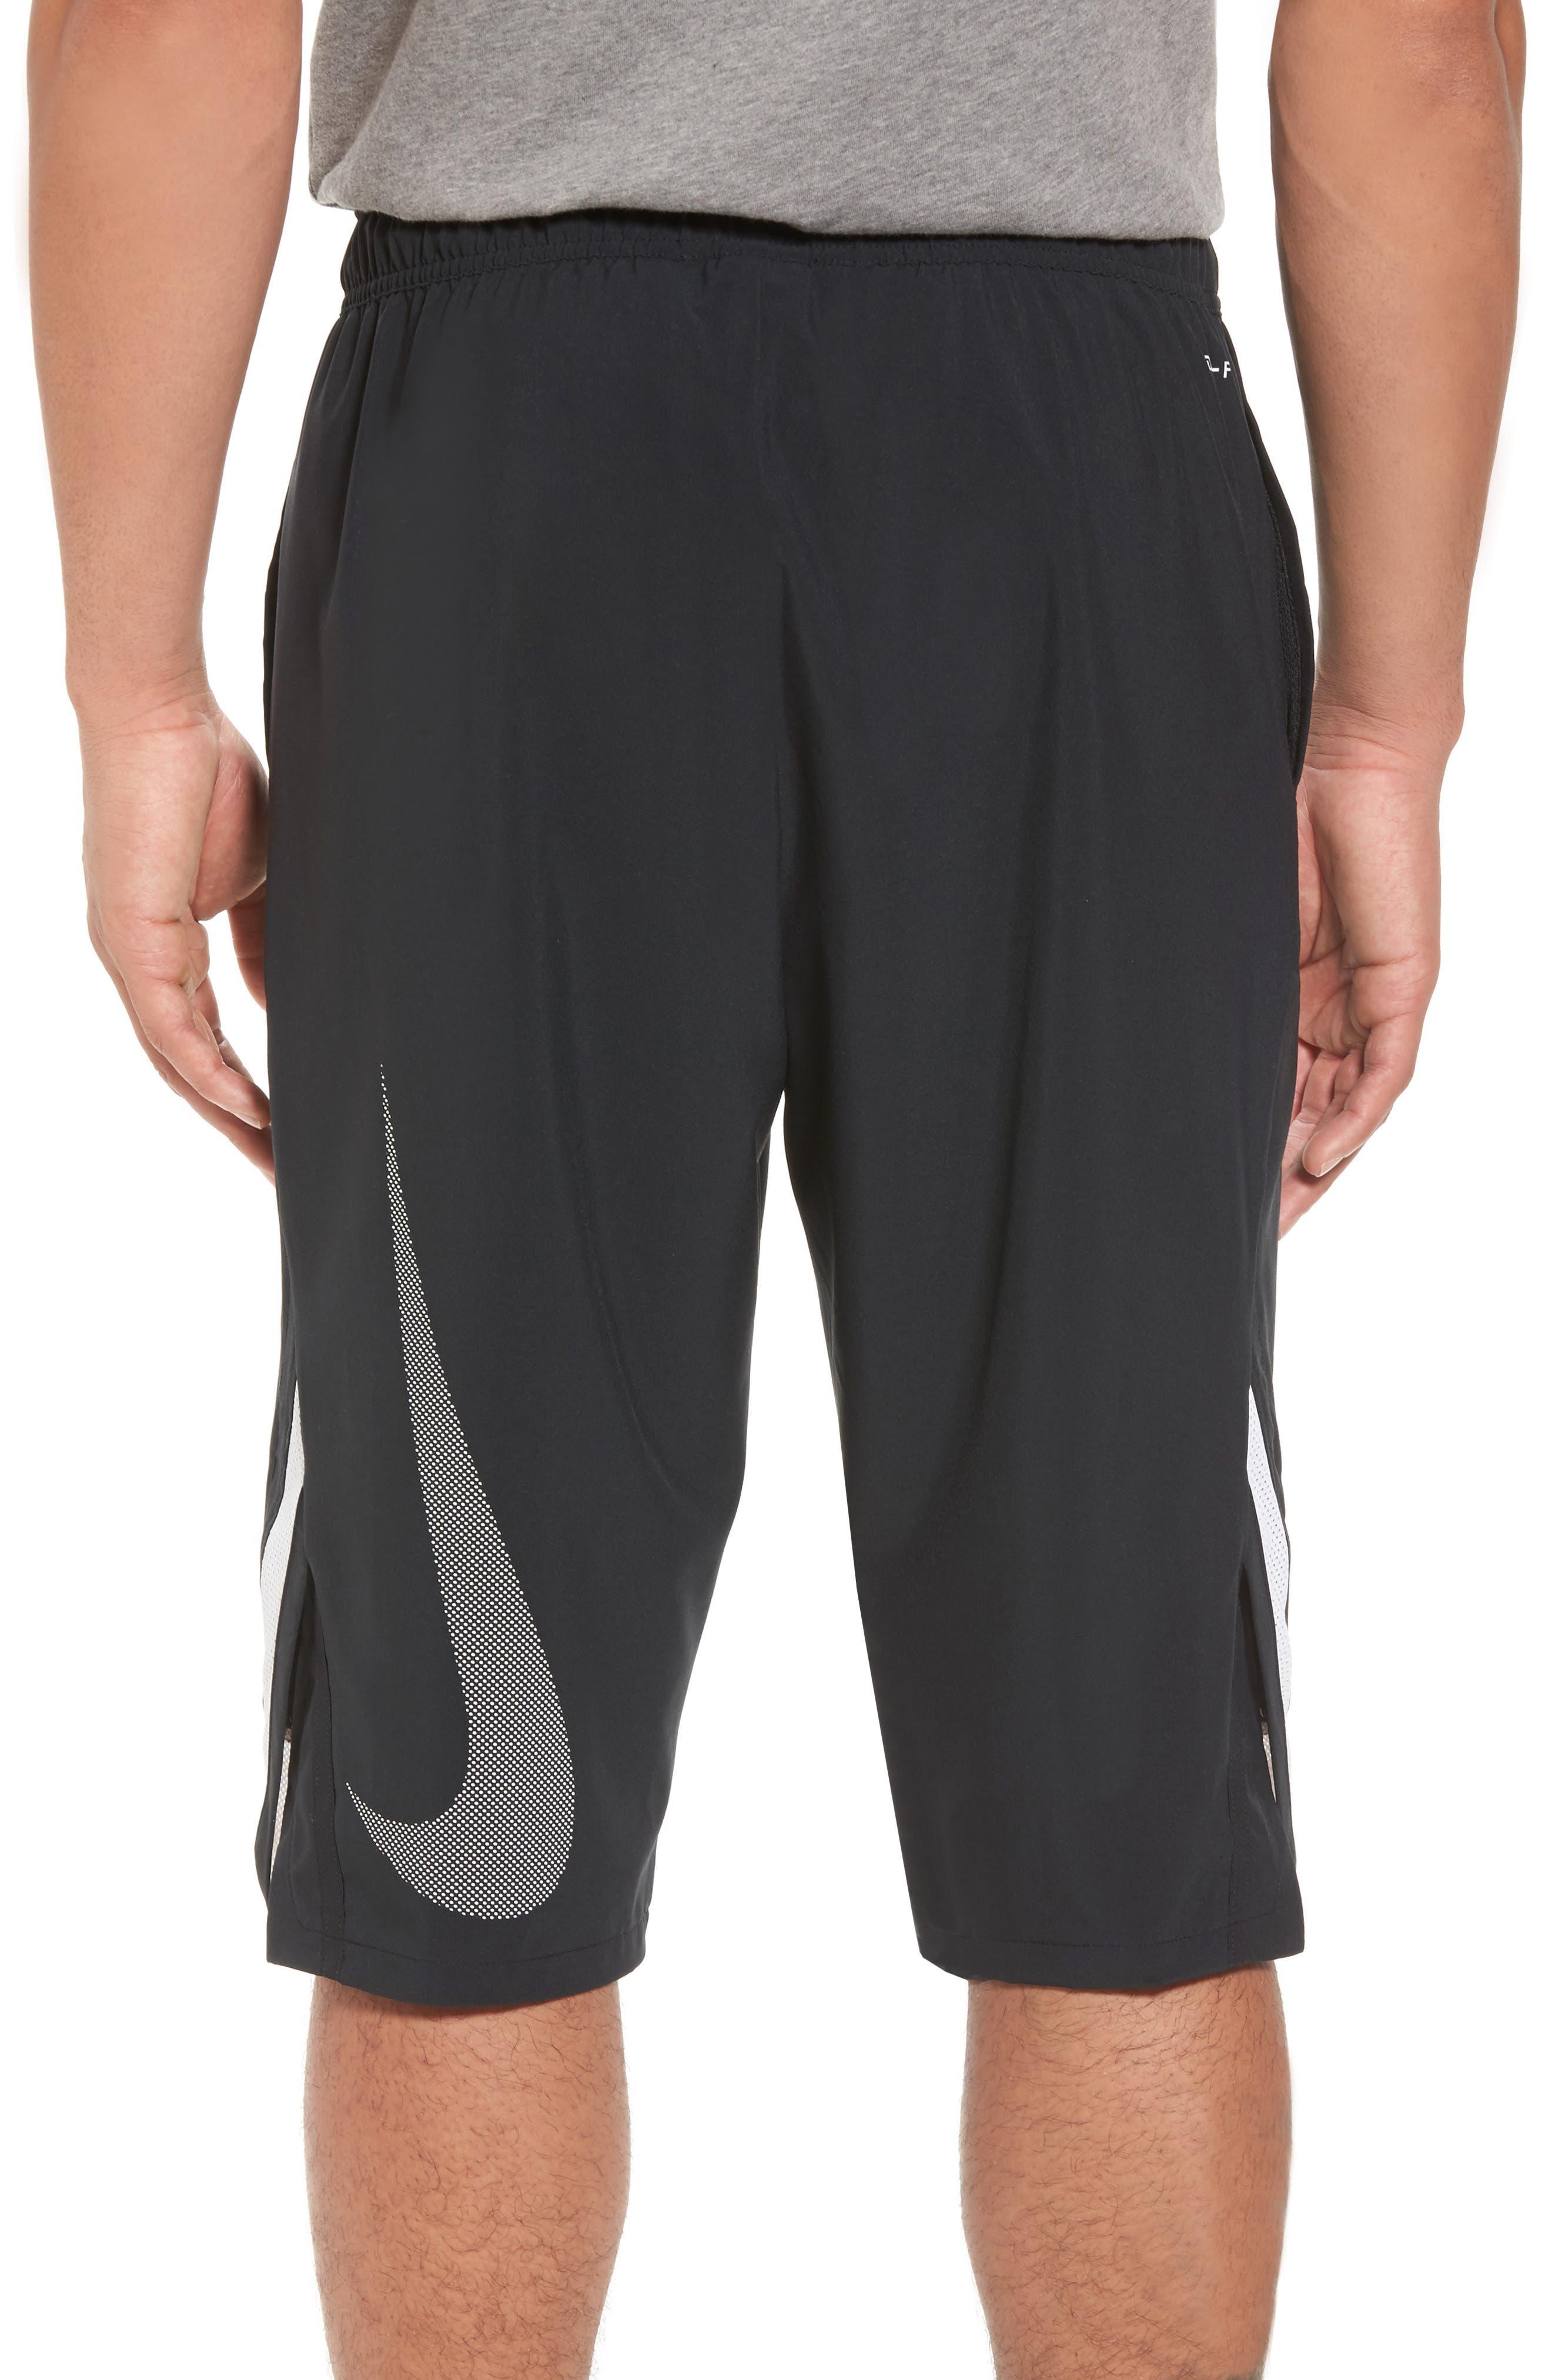 Training Flex PX Shorts,                             Alternate thumbnail 2, color,                             BLACK/ WHITE/ WHITE